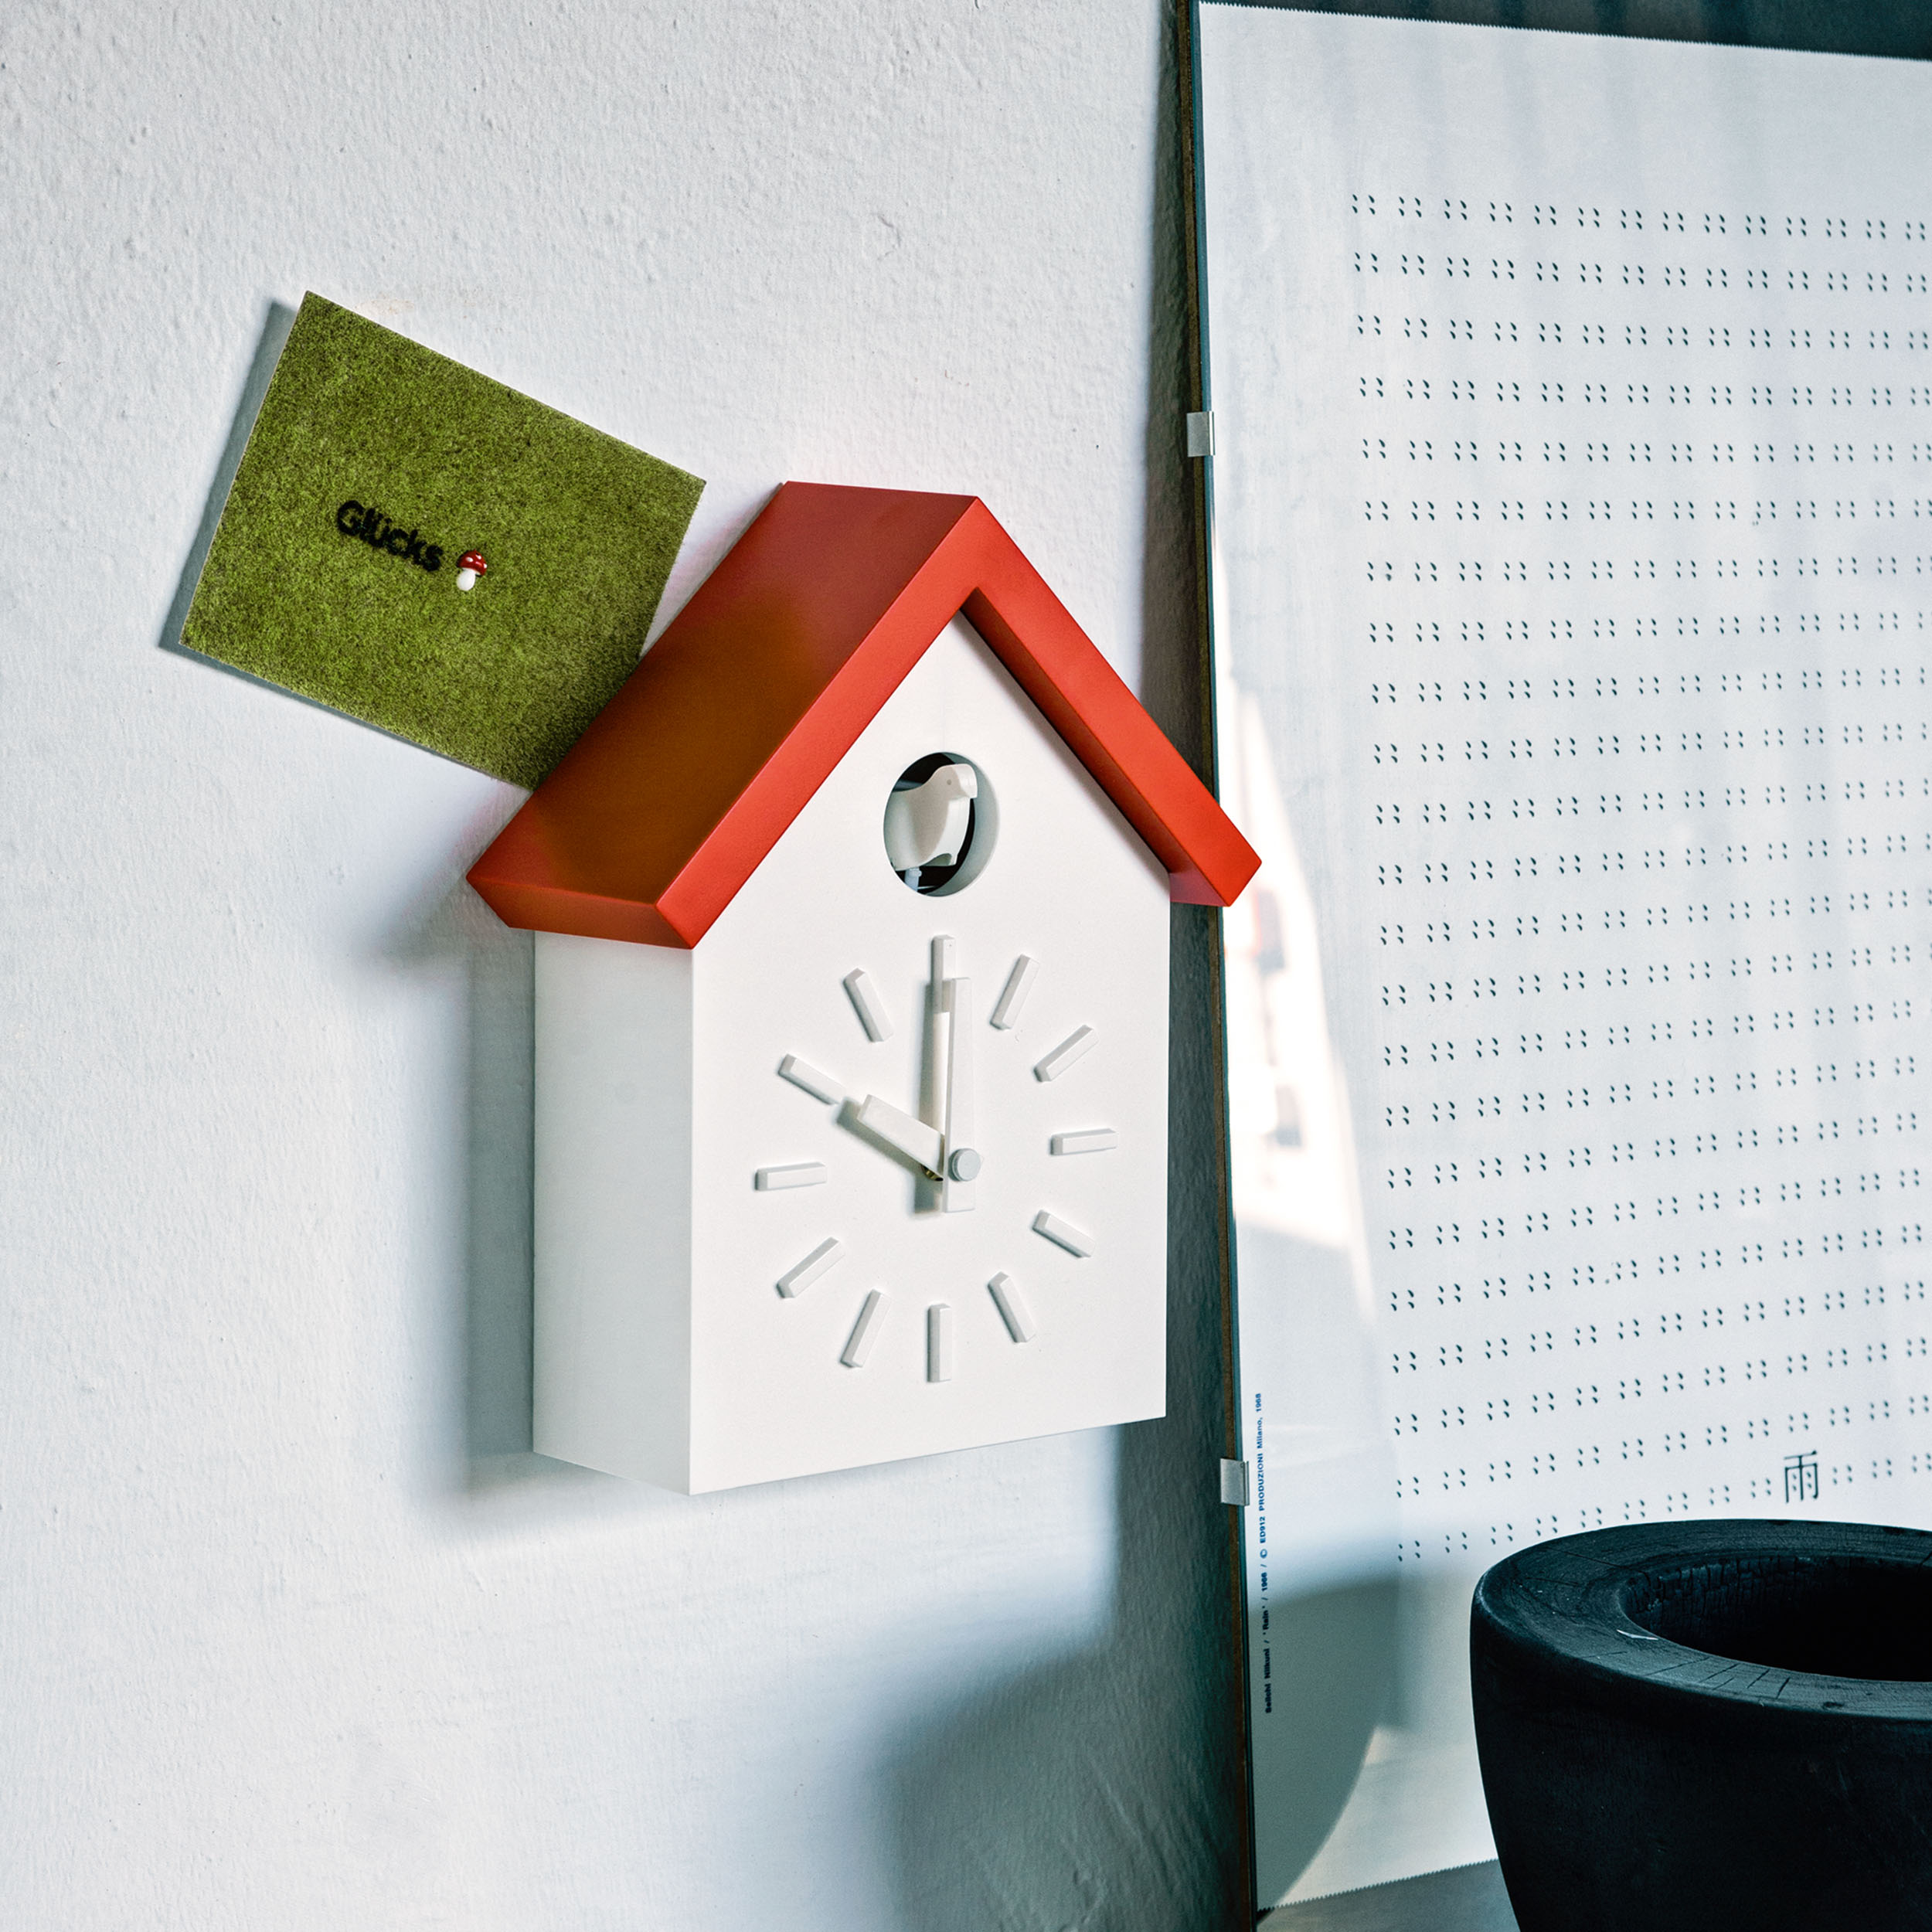 Cu-Clock Kuckucksuhr